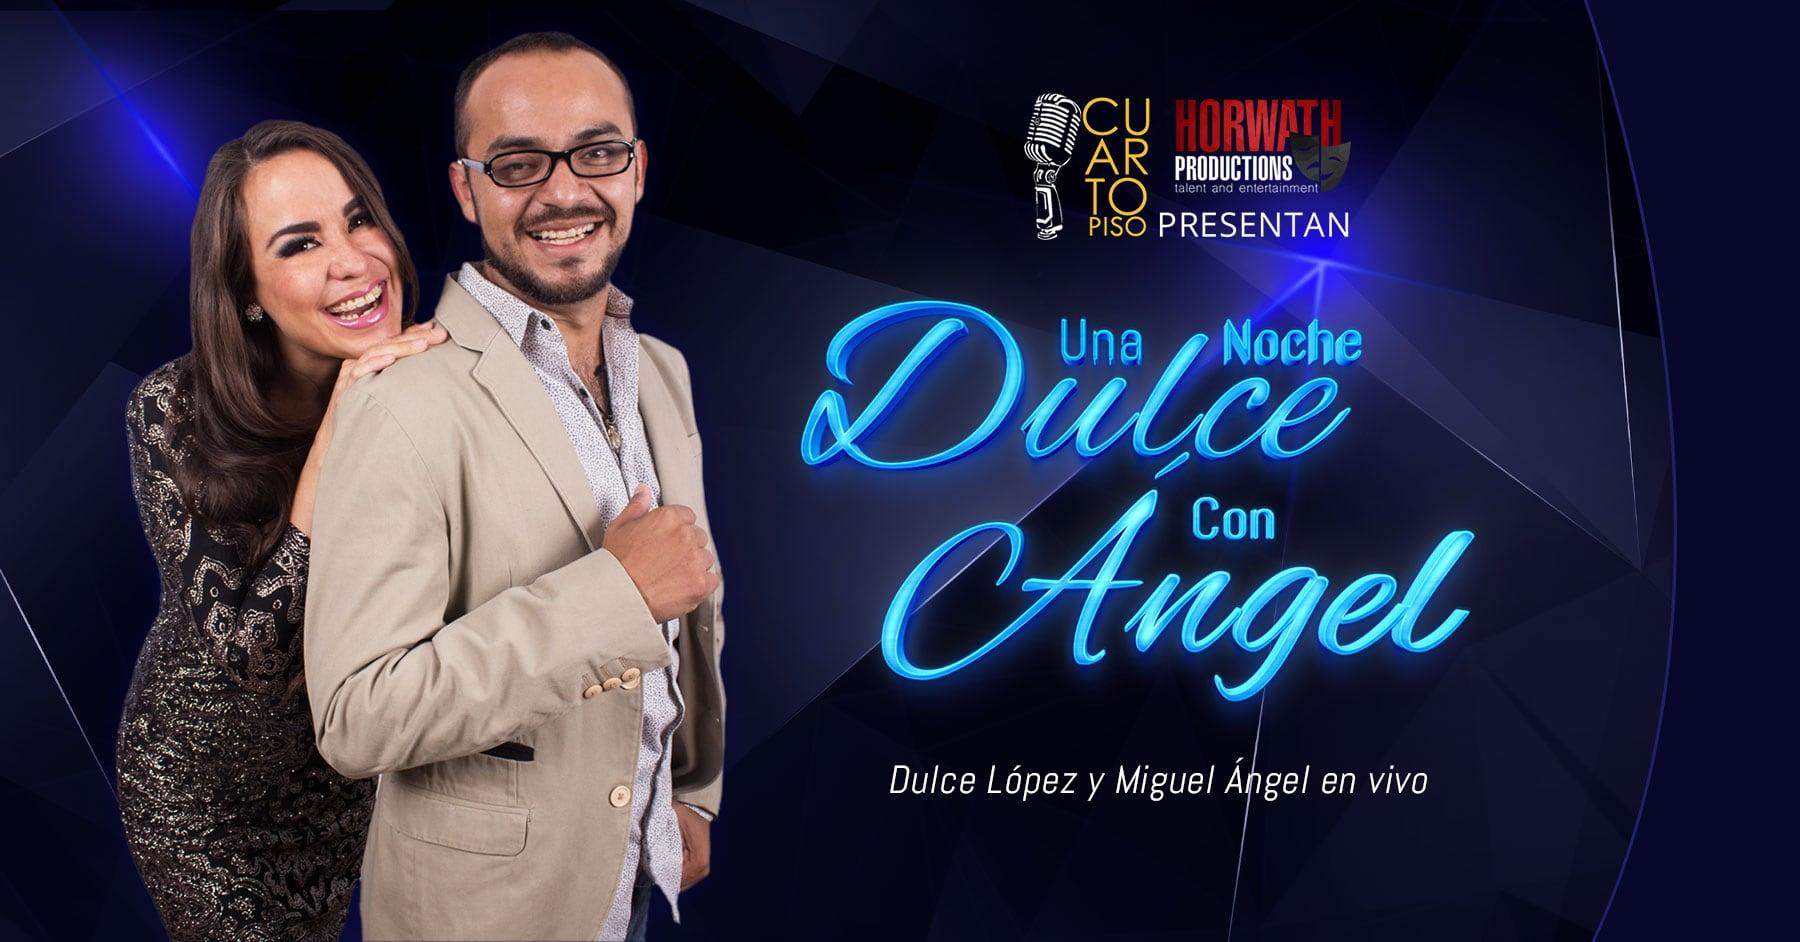 Una Noche Dulce con Ángel